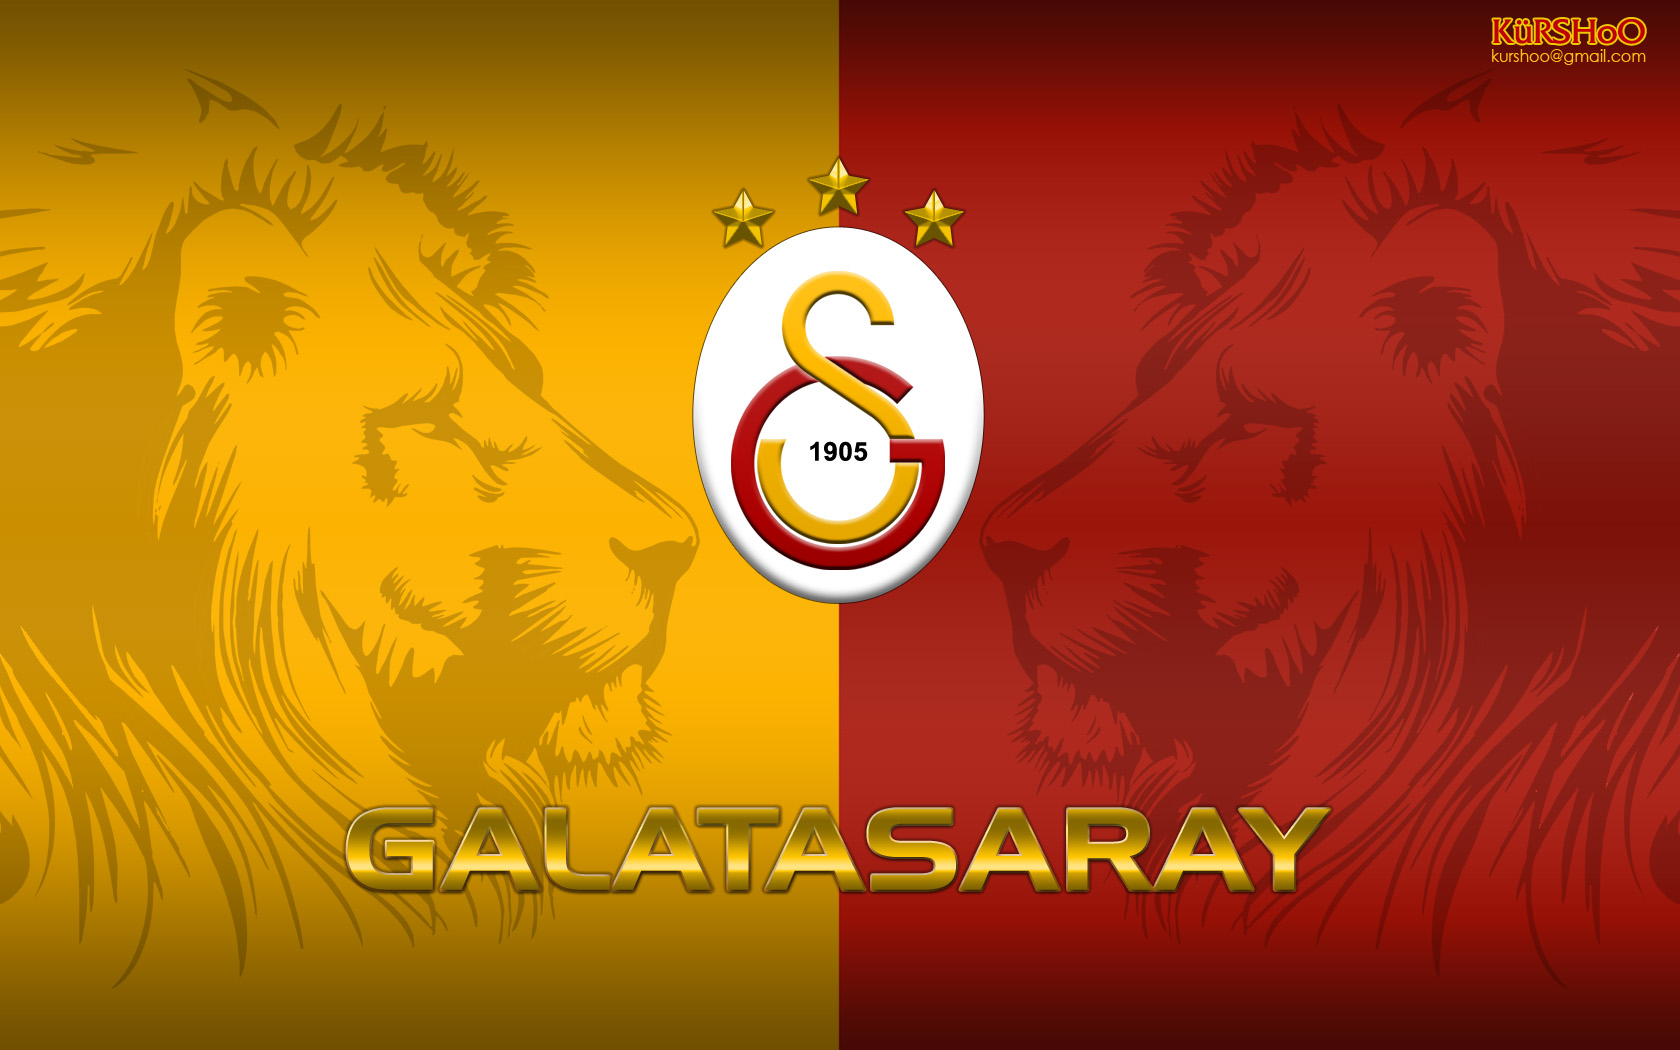 Galatasaray-Wallpaper-HD1